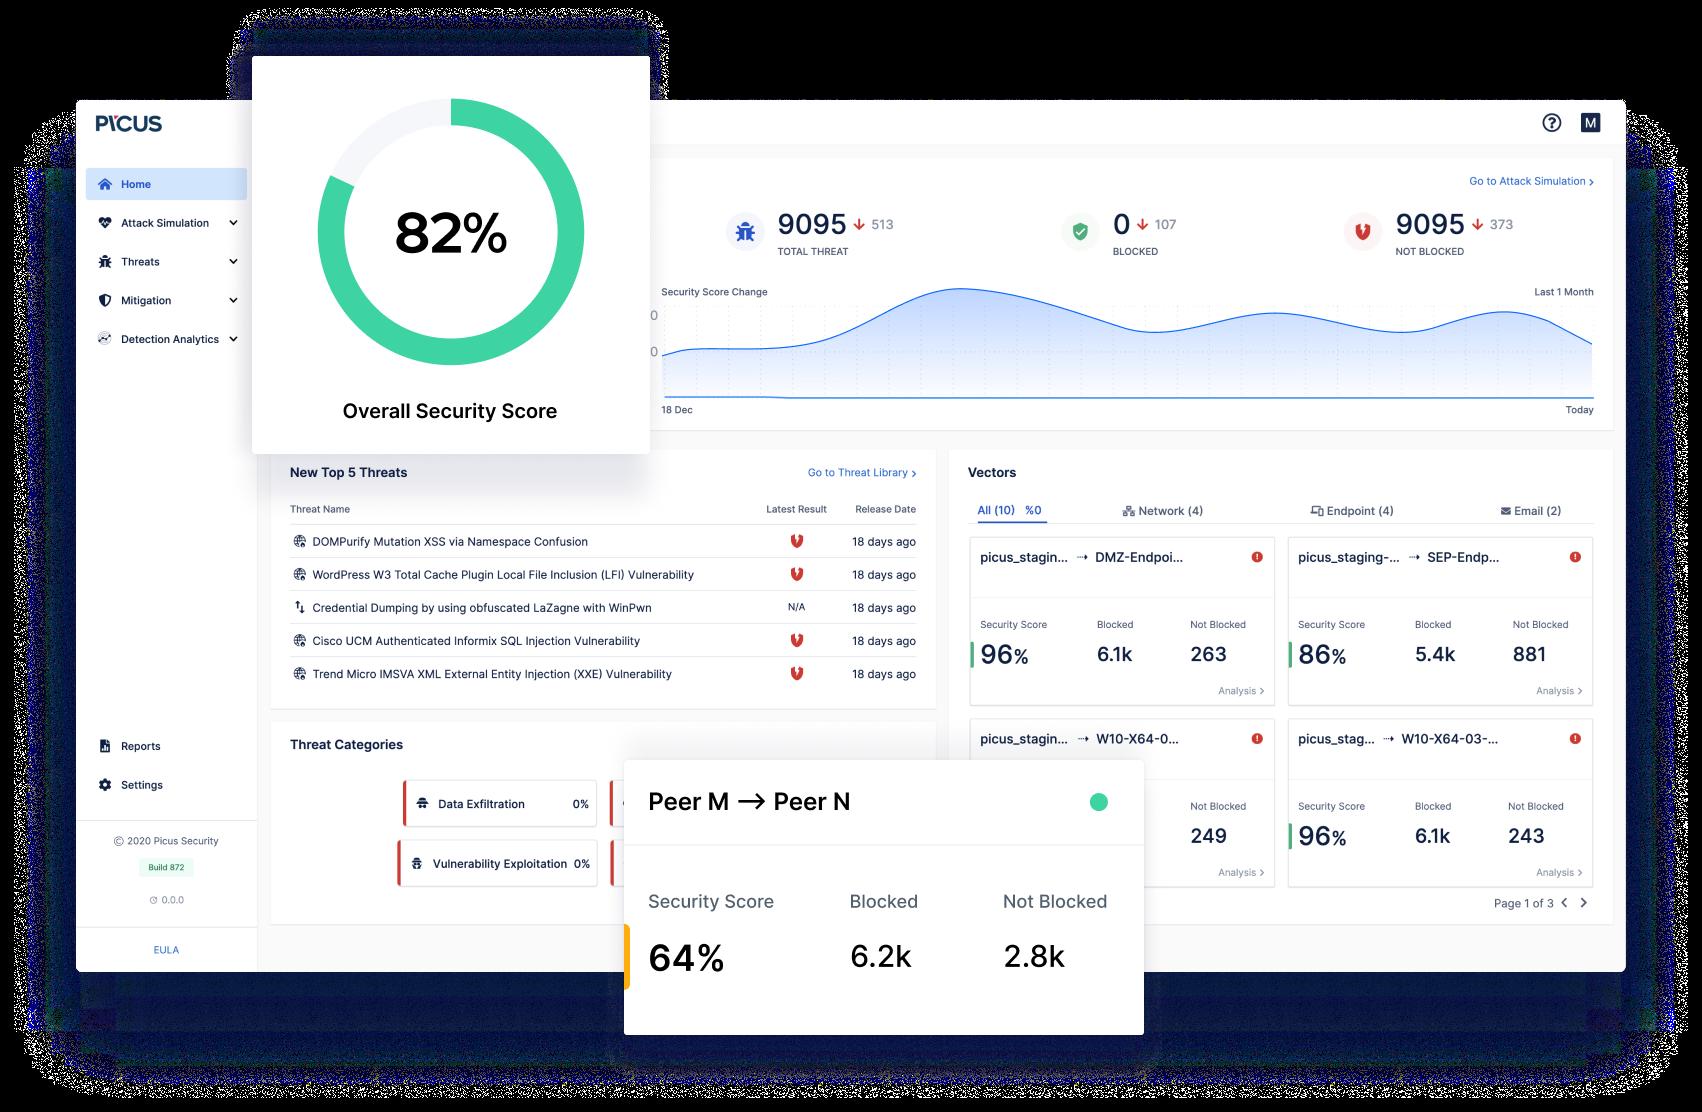 picus complete security control validation platform